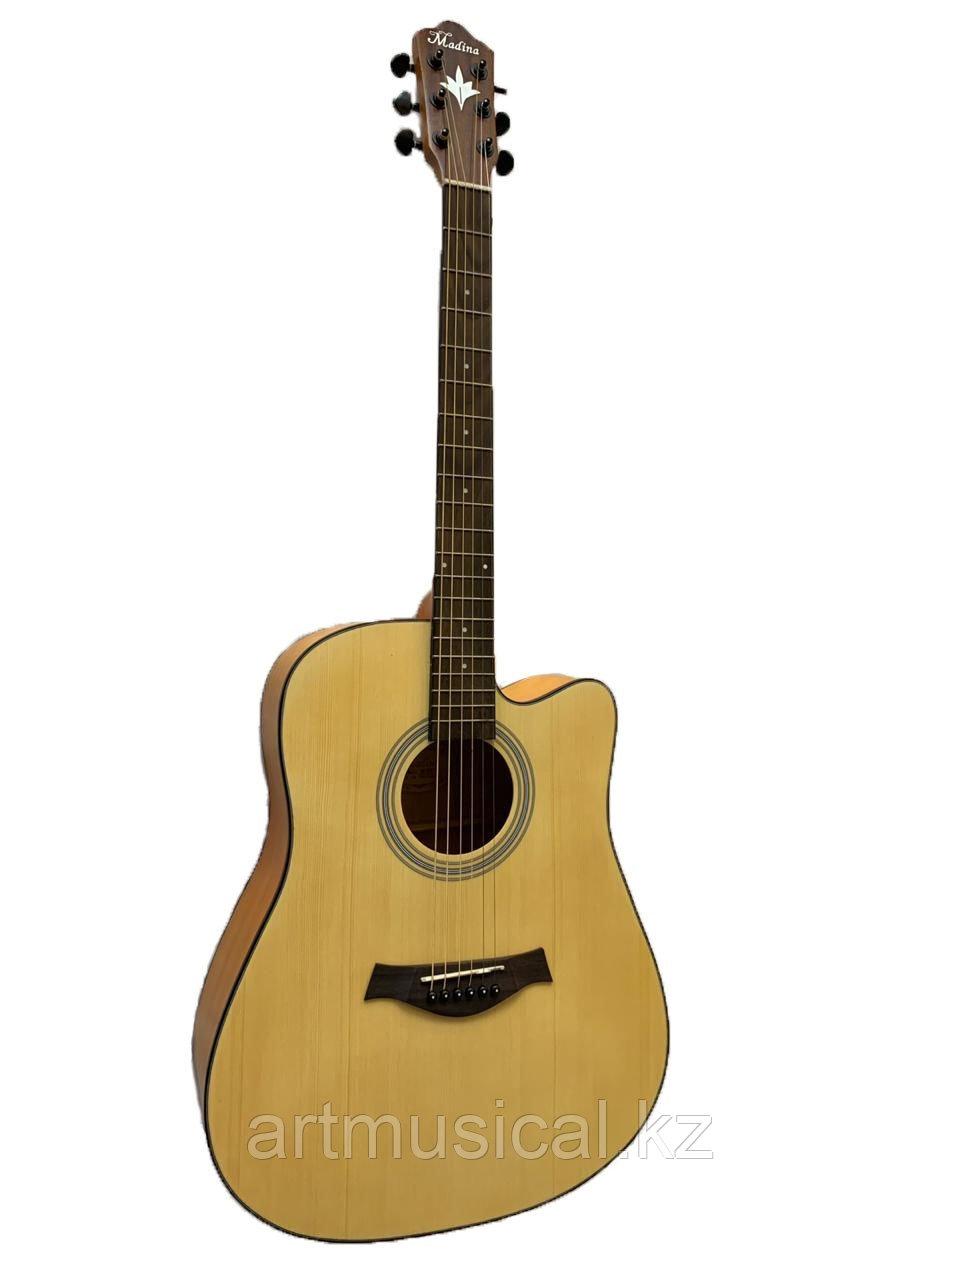 Гитара  концертная Madina M-011C